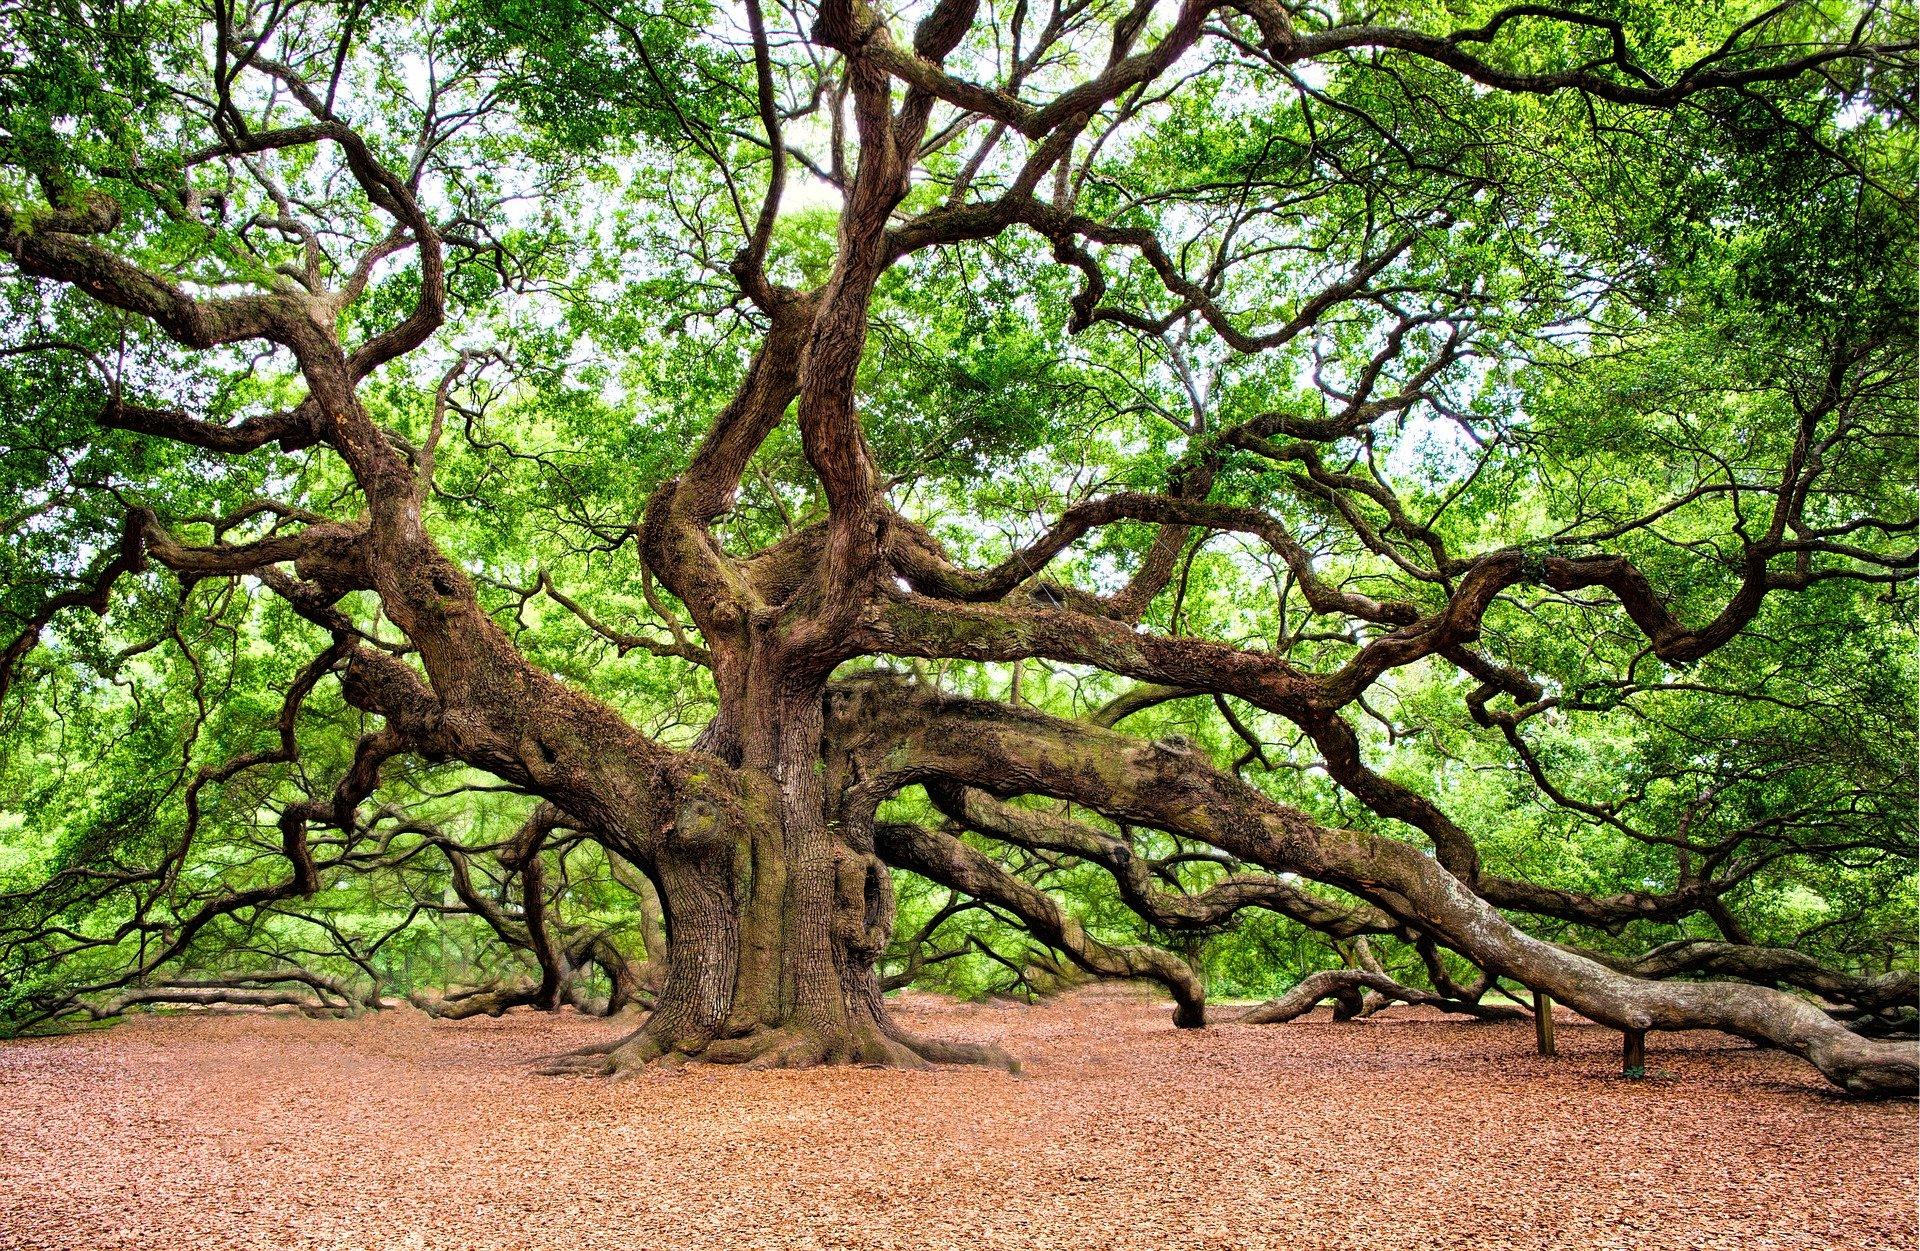 Large tree. Image by RegalShave from Pixabay https://pixabay.com/photos/oak-tree-tree-huge-old-charleston-2018822/